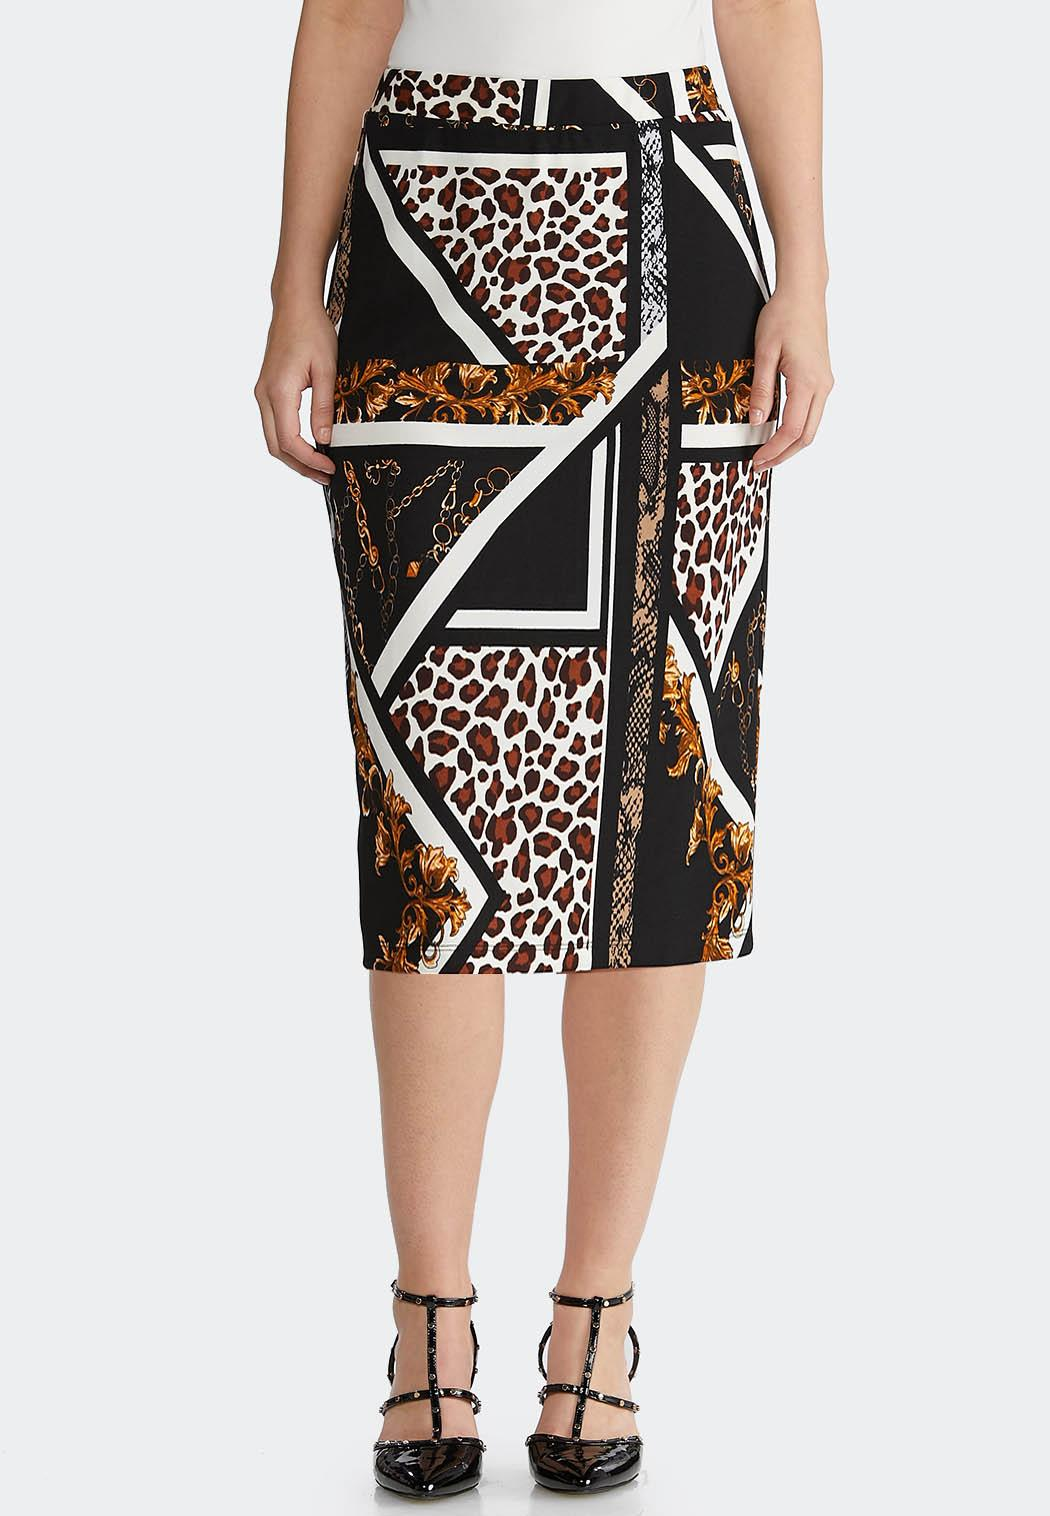 Plus Size Status Animal Pencil Skirt